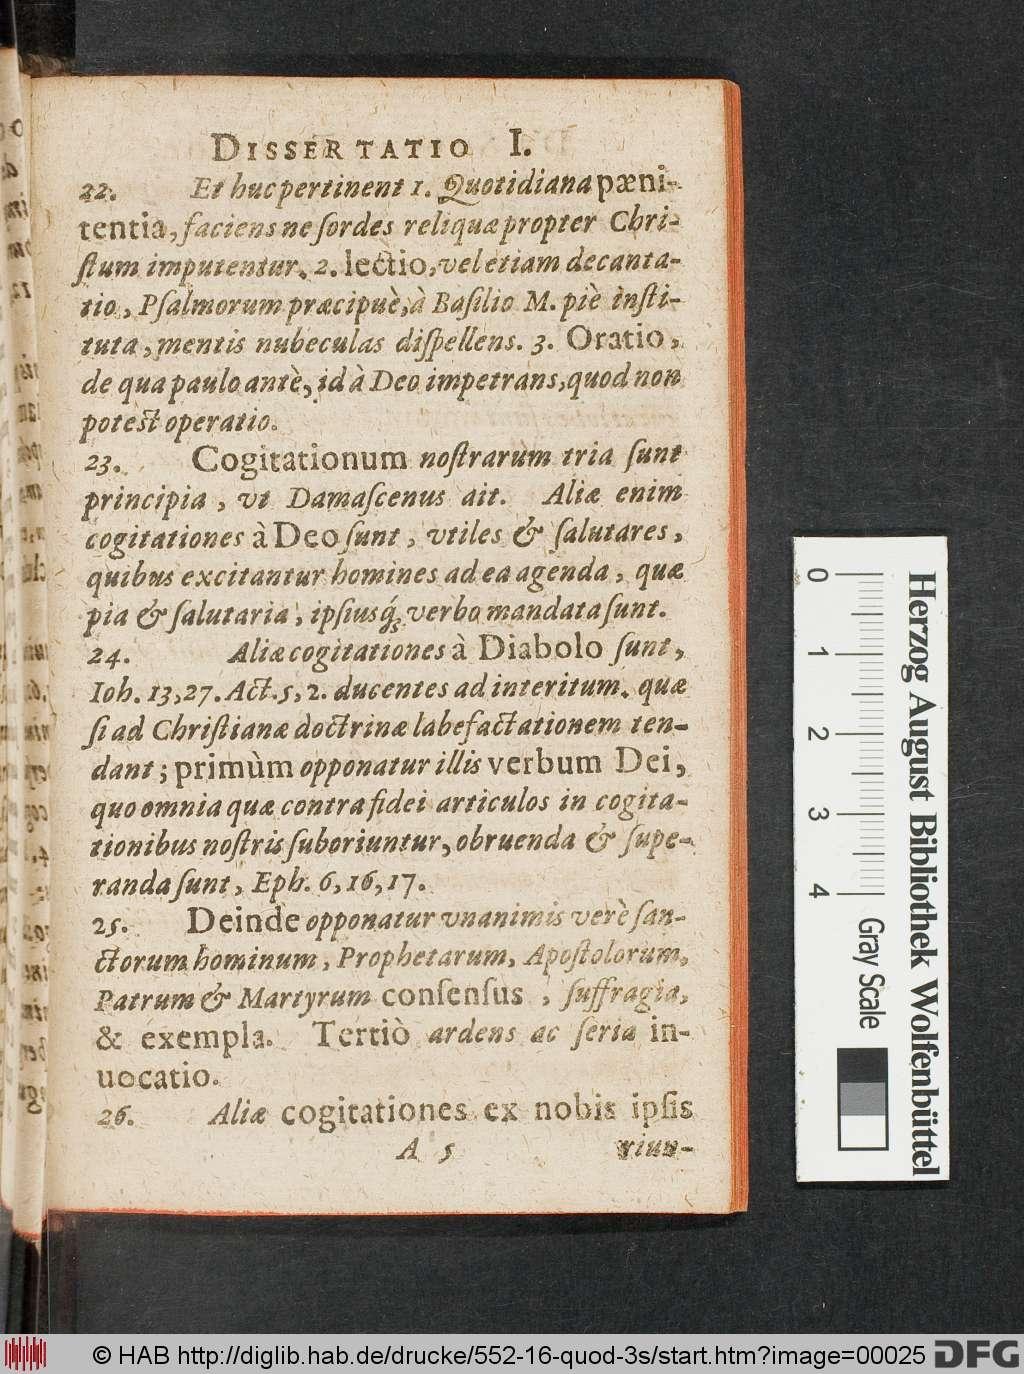 http://diglib.hab.de/drucke/552-16-quod-3s/00025.jpg